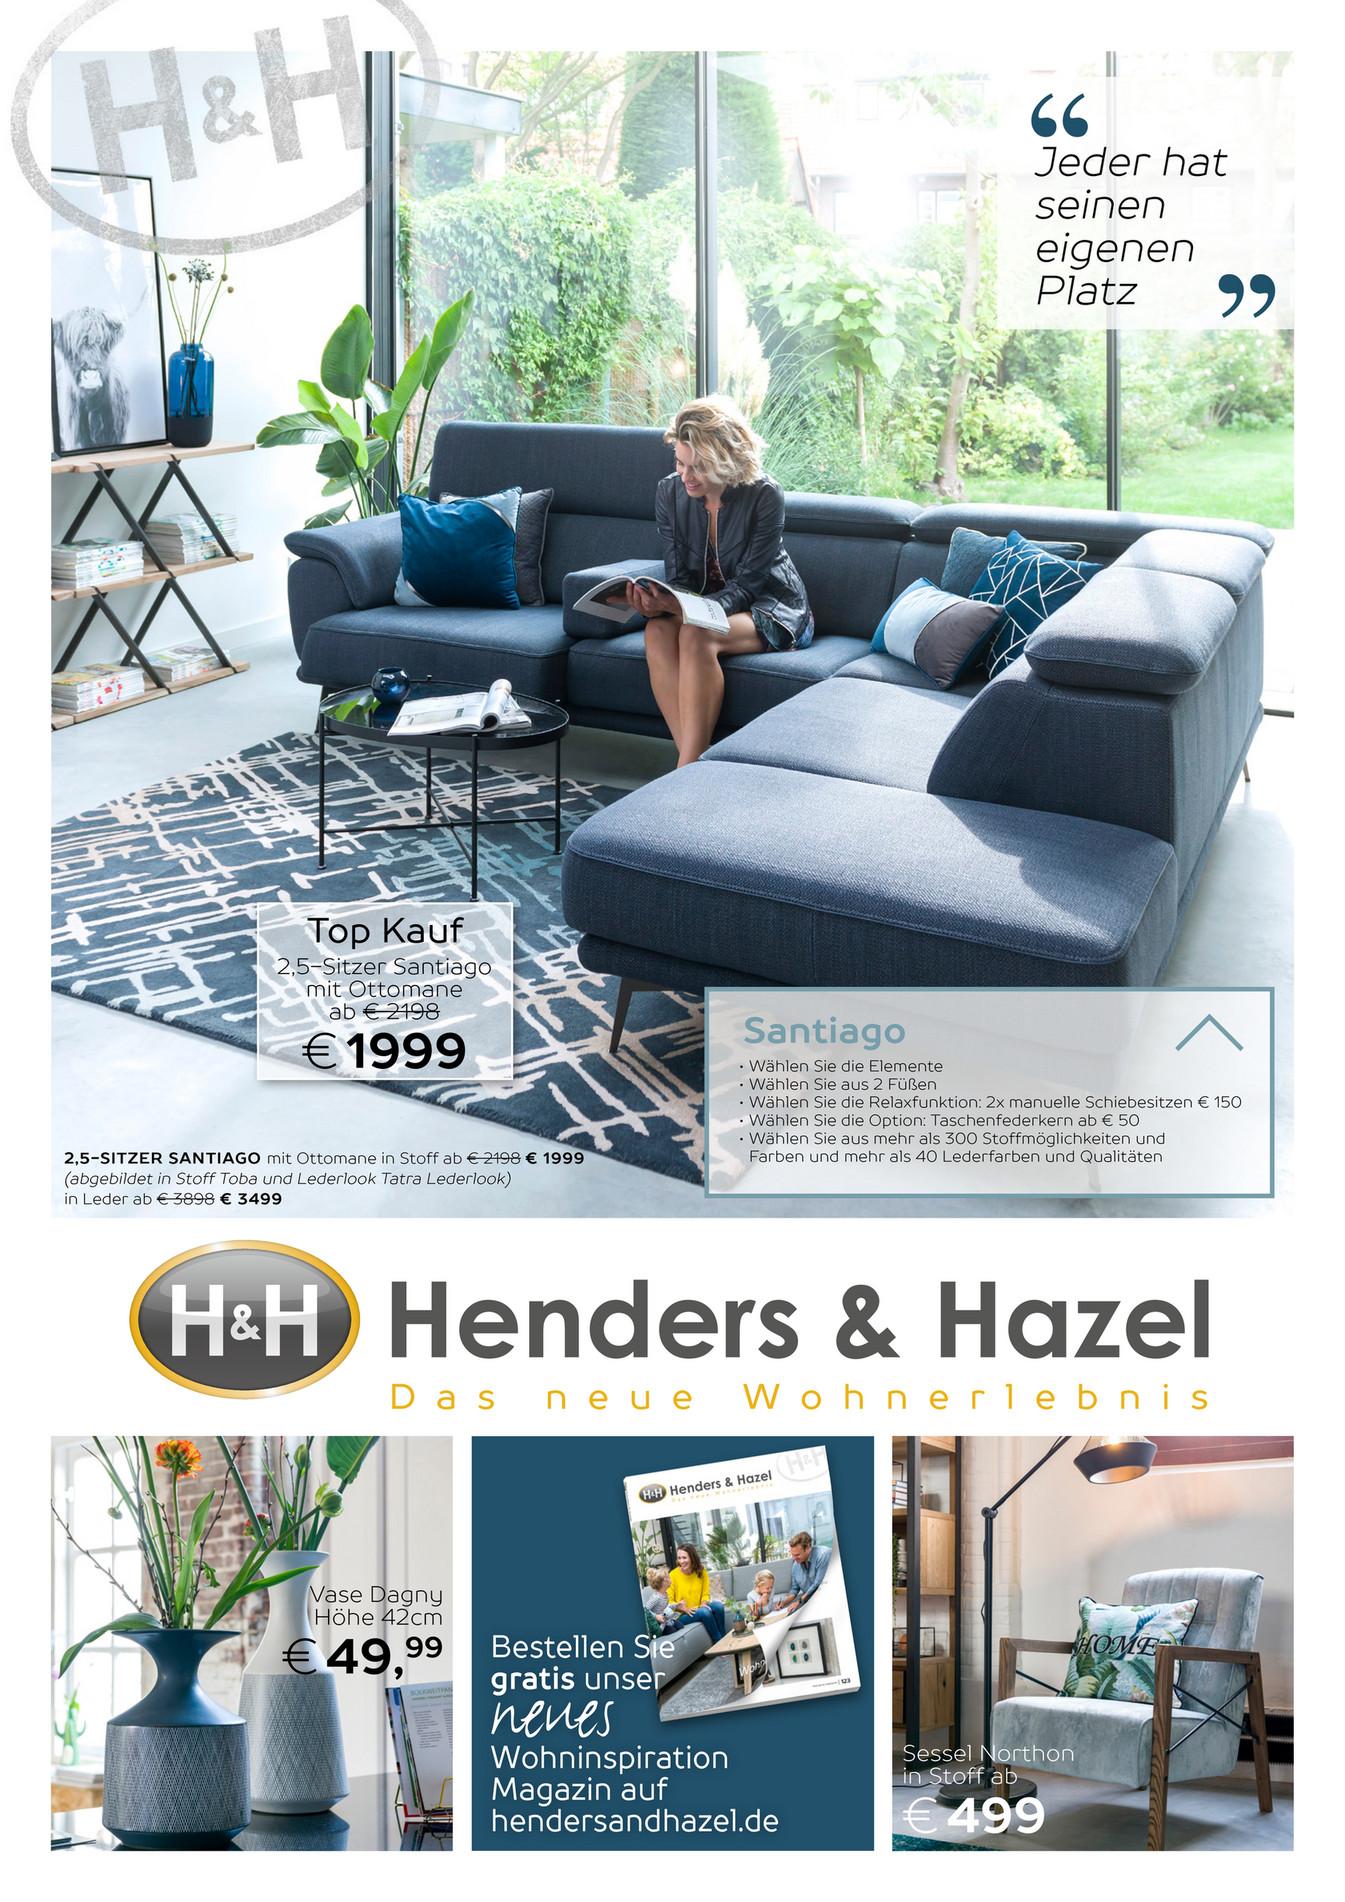 Henders & Hazel Deutschland - Prospect 2 Henders & Hazel 2019 - Seite 1